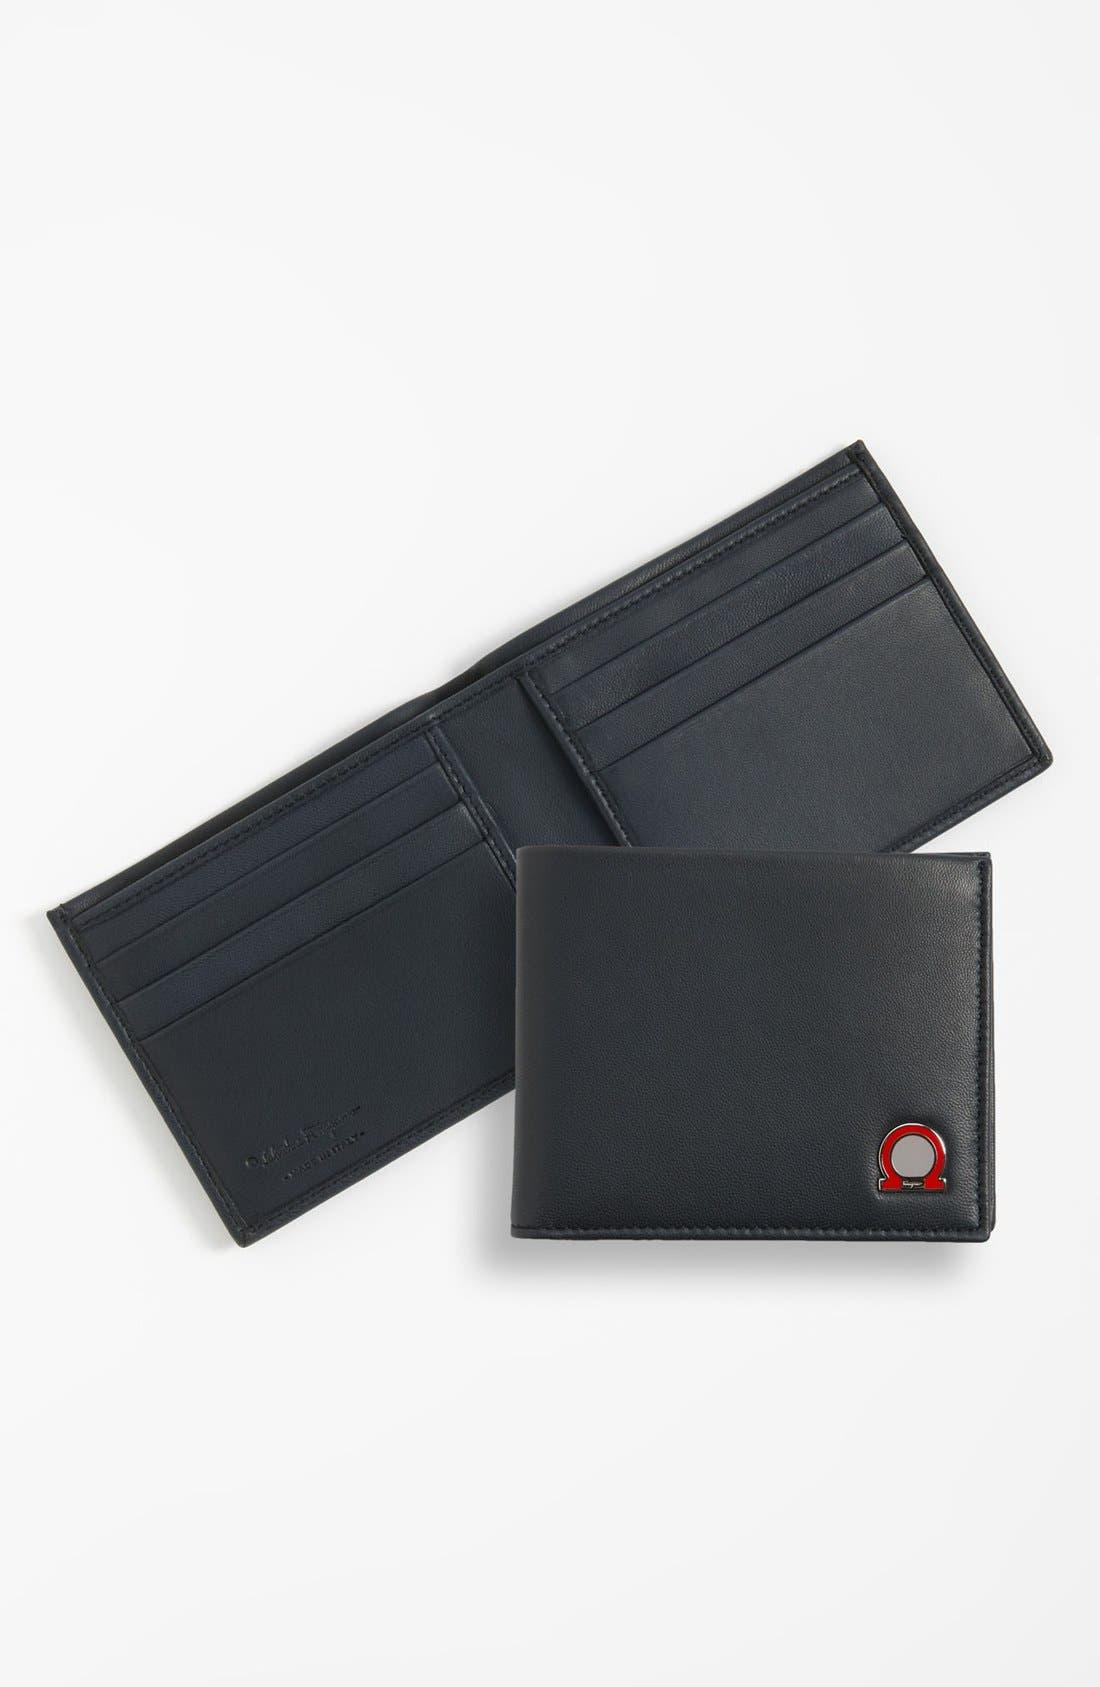 Alternate Image 1 Selected - Salvatore Ferragamo 'American - Tribute' Wallet